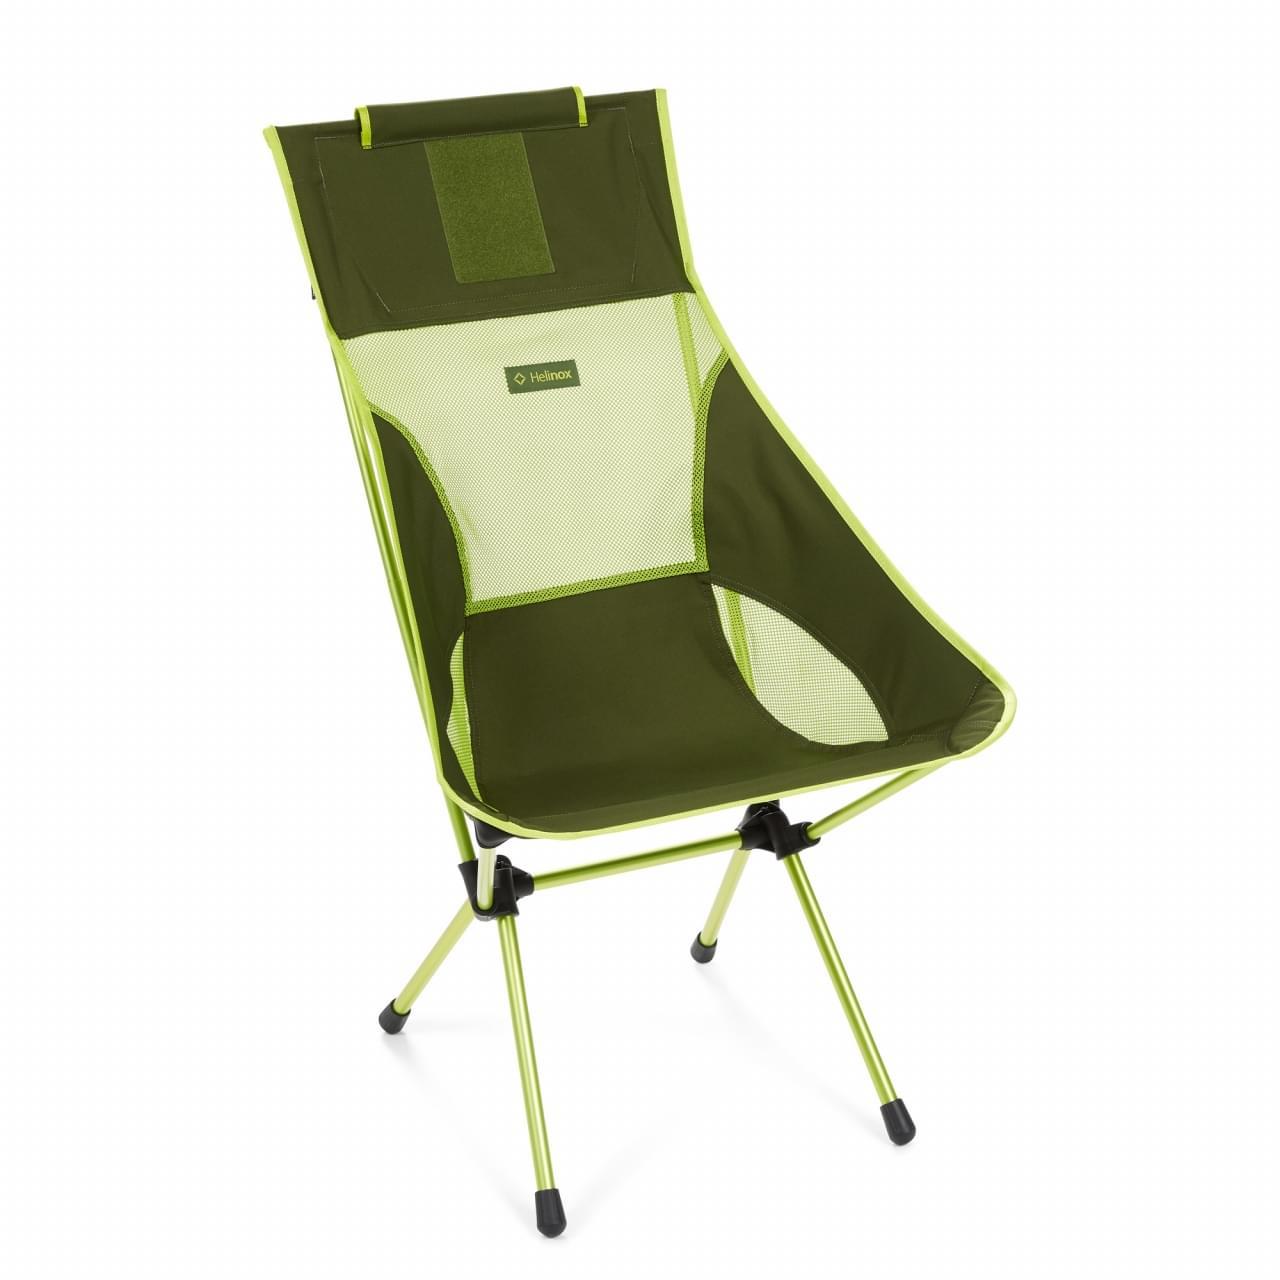 Helinox Sunset Chair Block Lichtgewicht Stoel - Groen